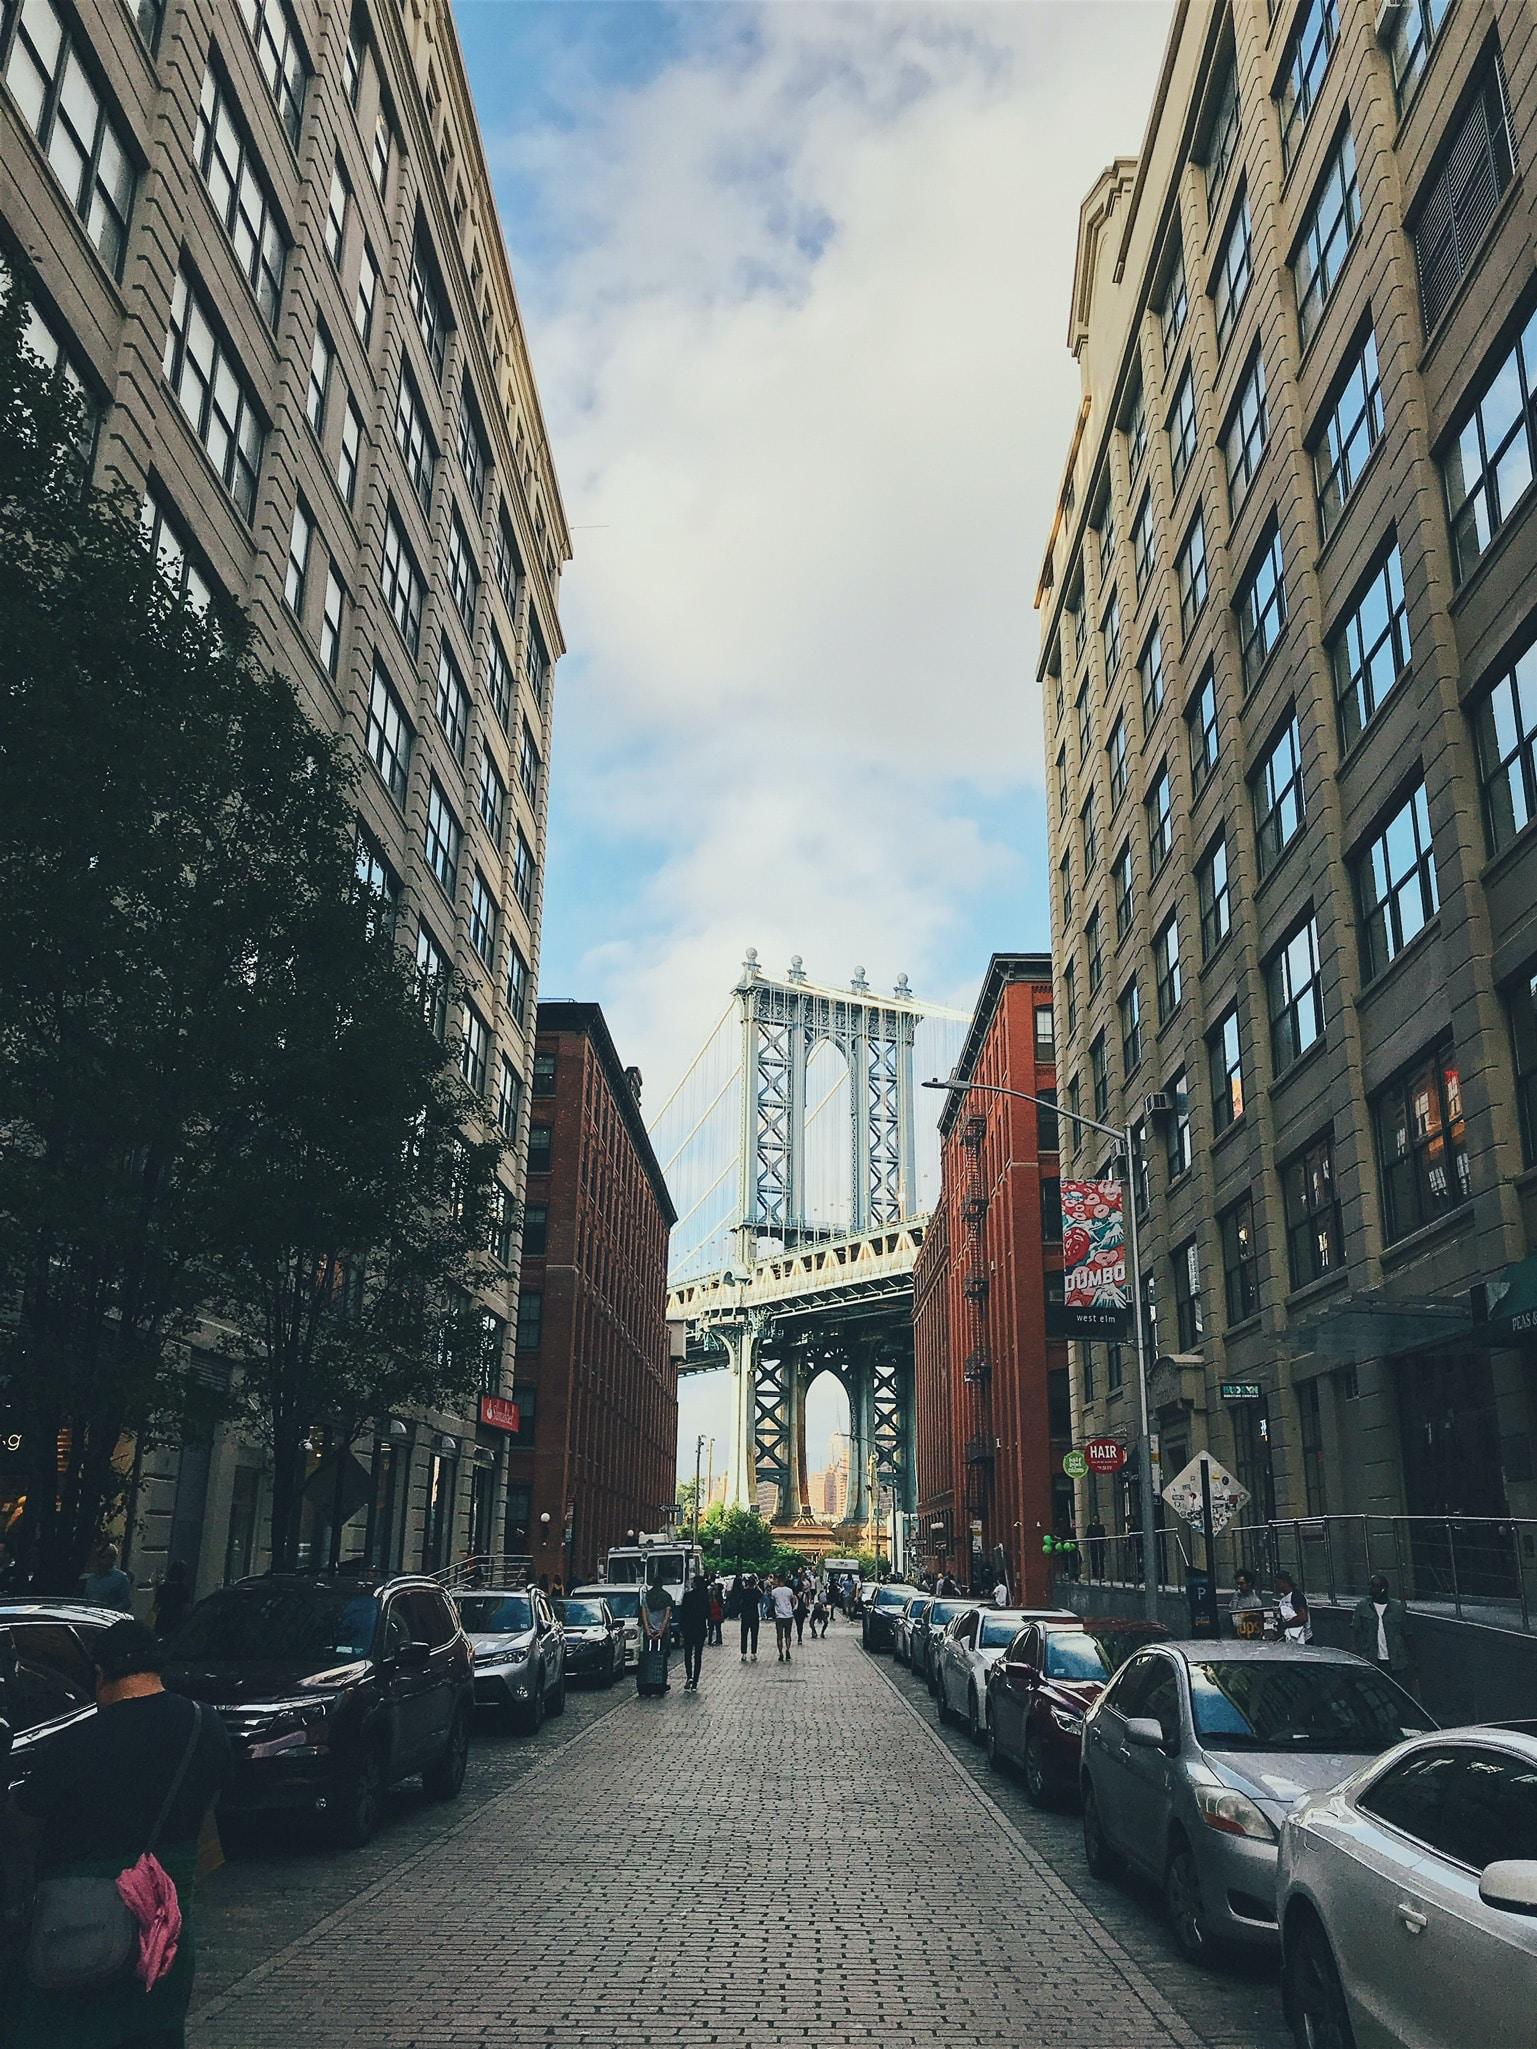 group of people walked in street in front of Manhattan bridge